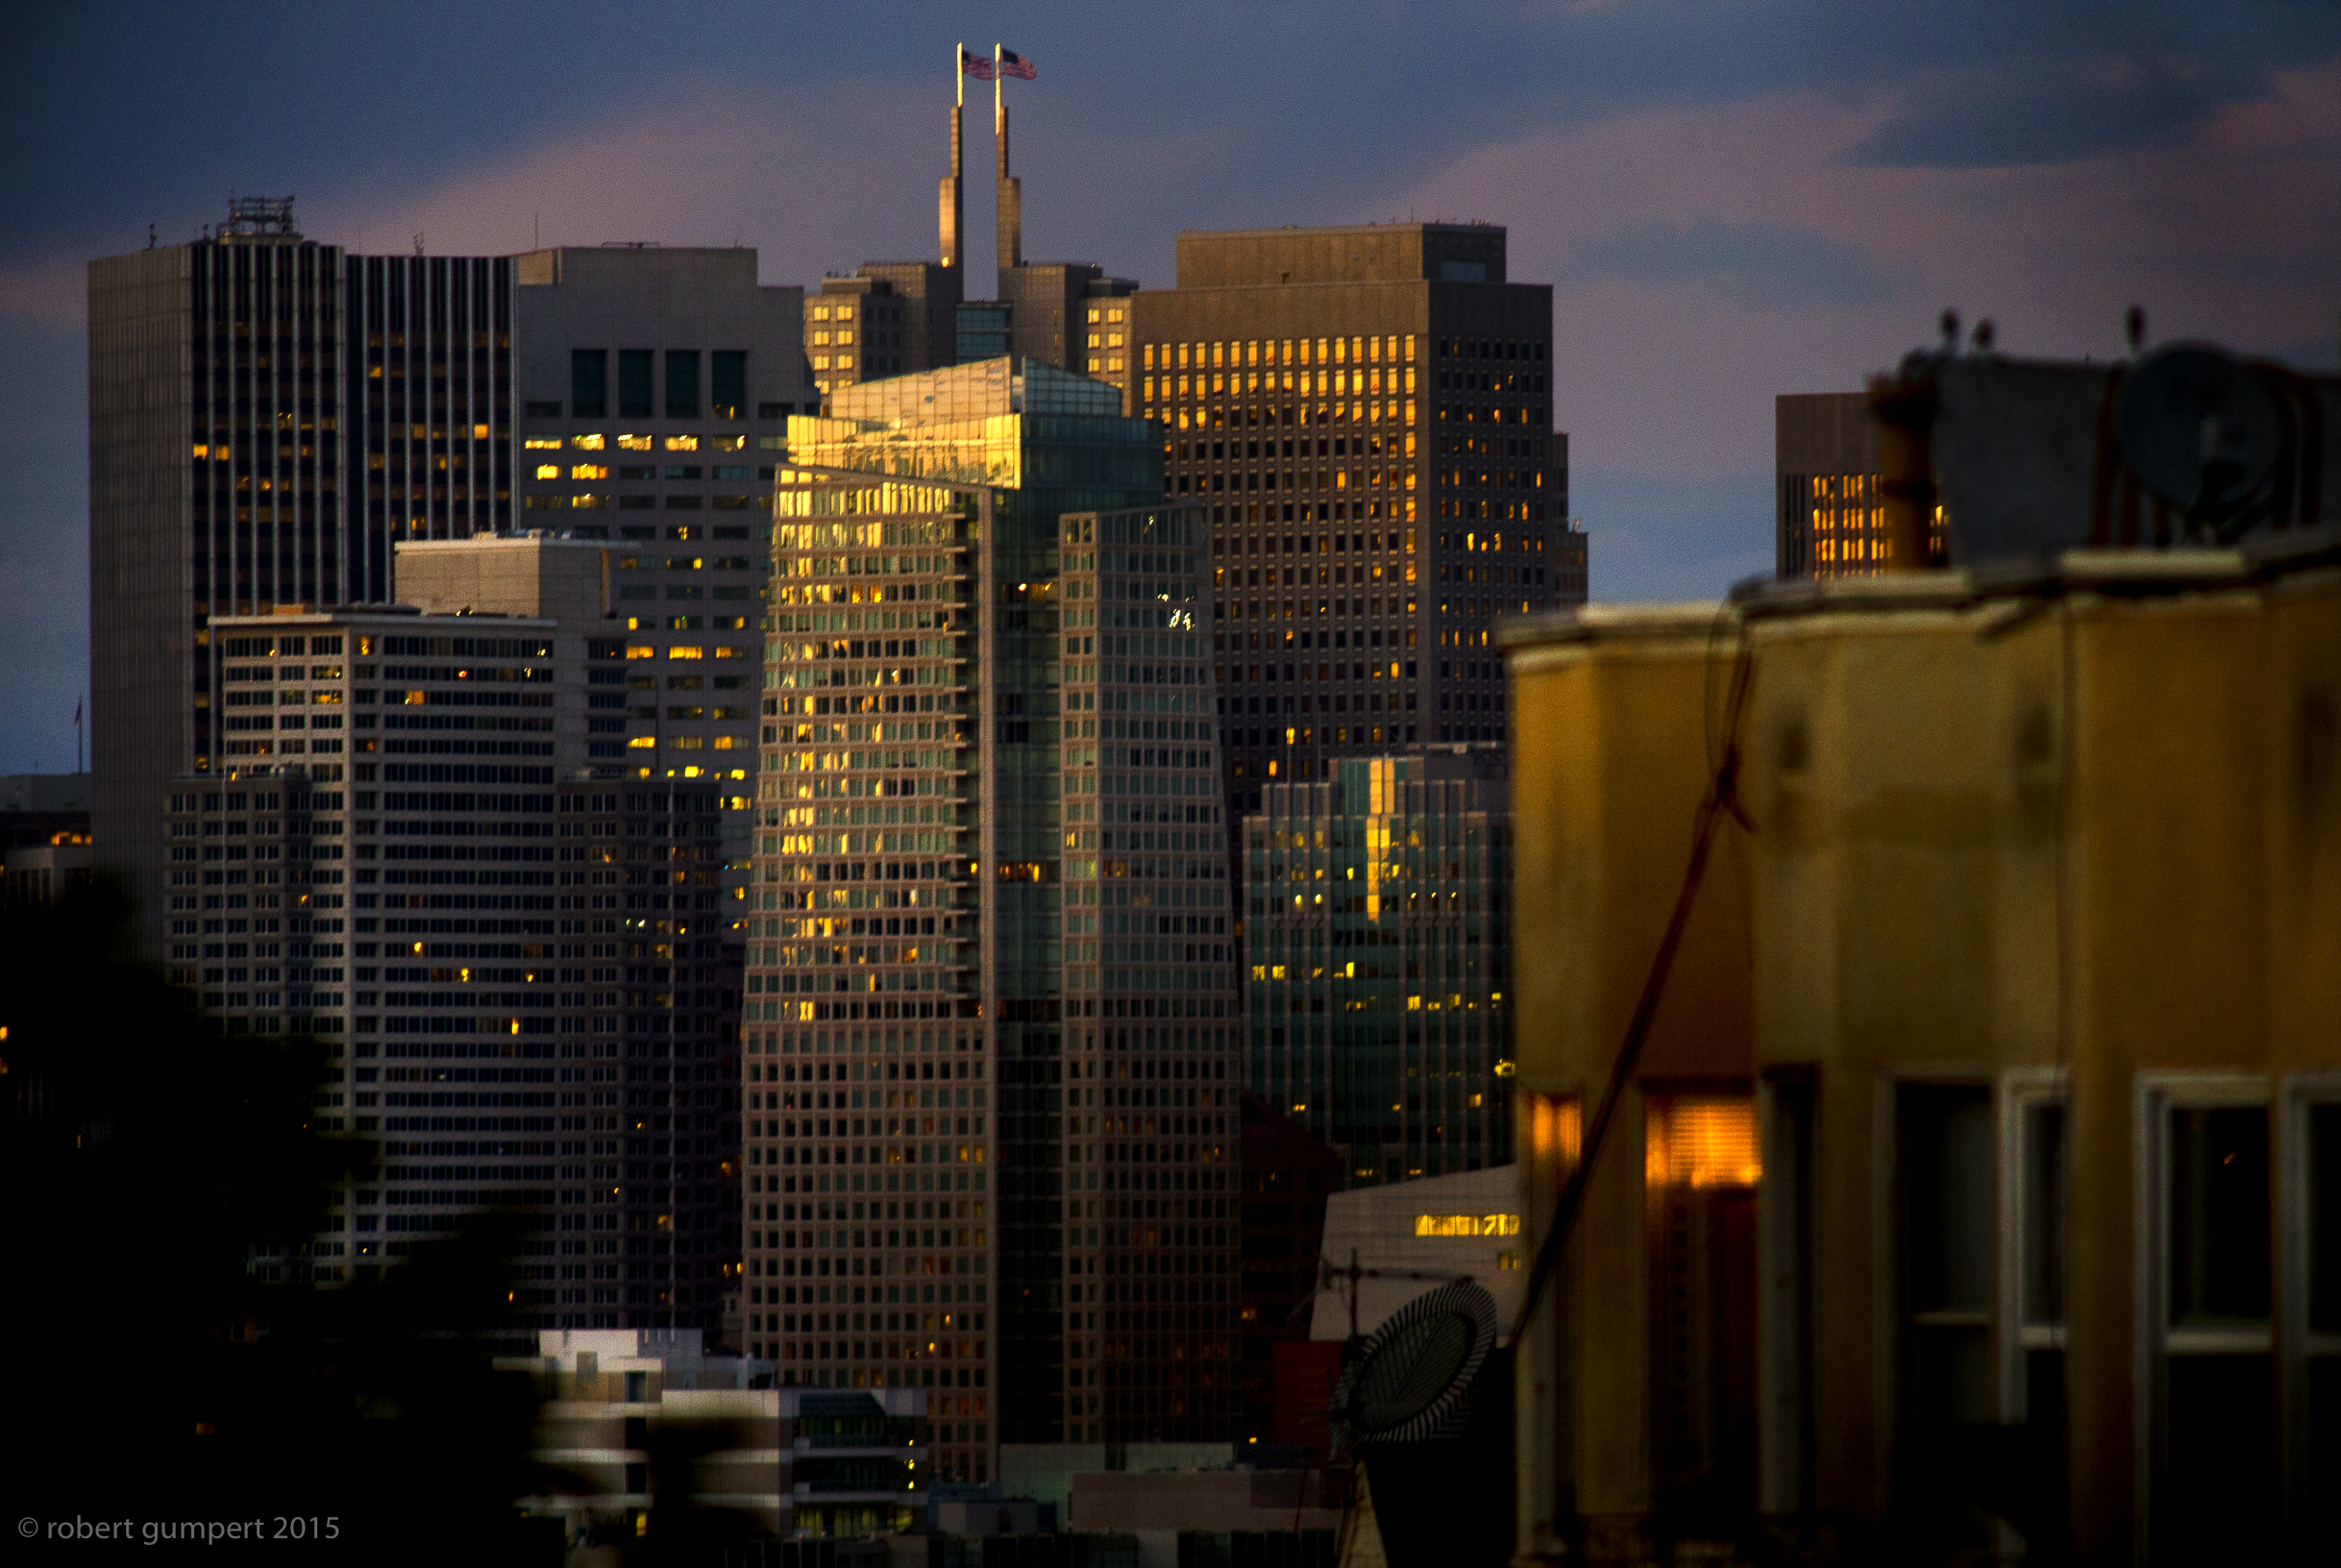 19 October 2015: Downtown SF from a Potrero Hill backyard